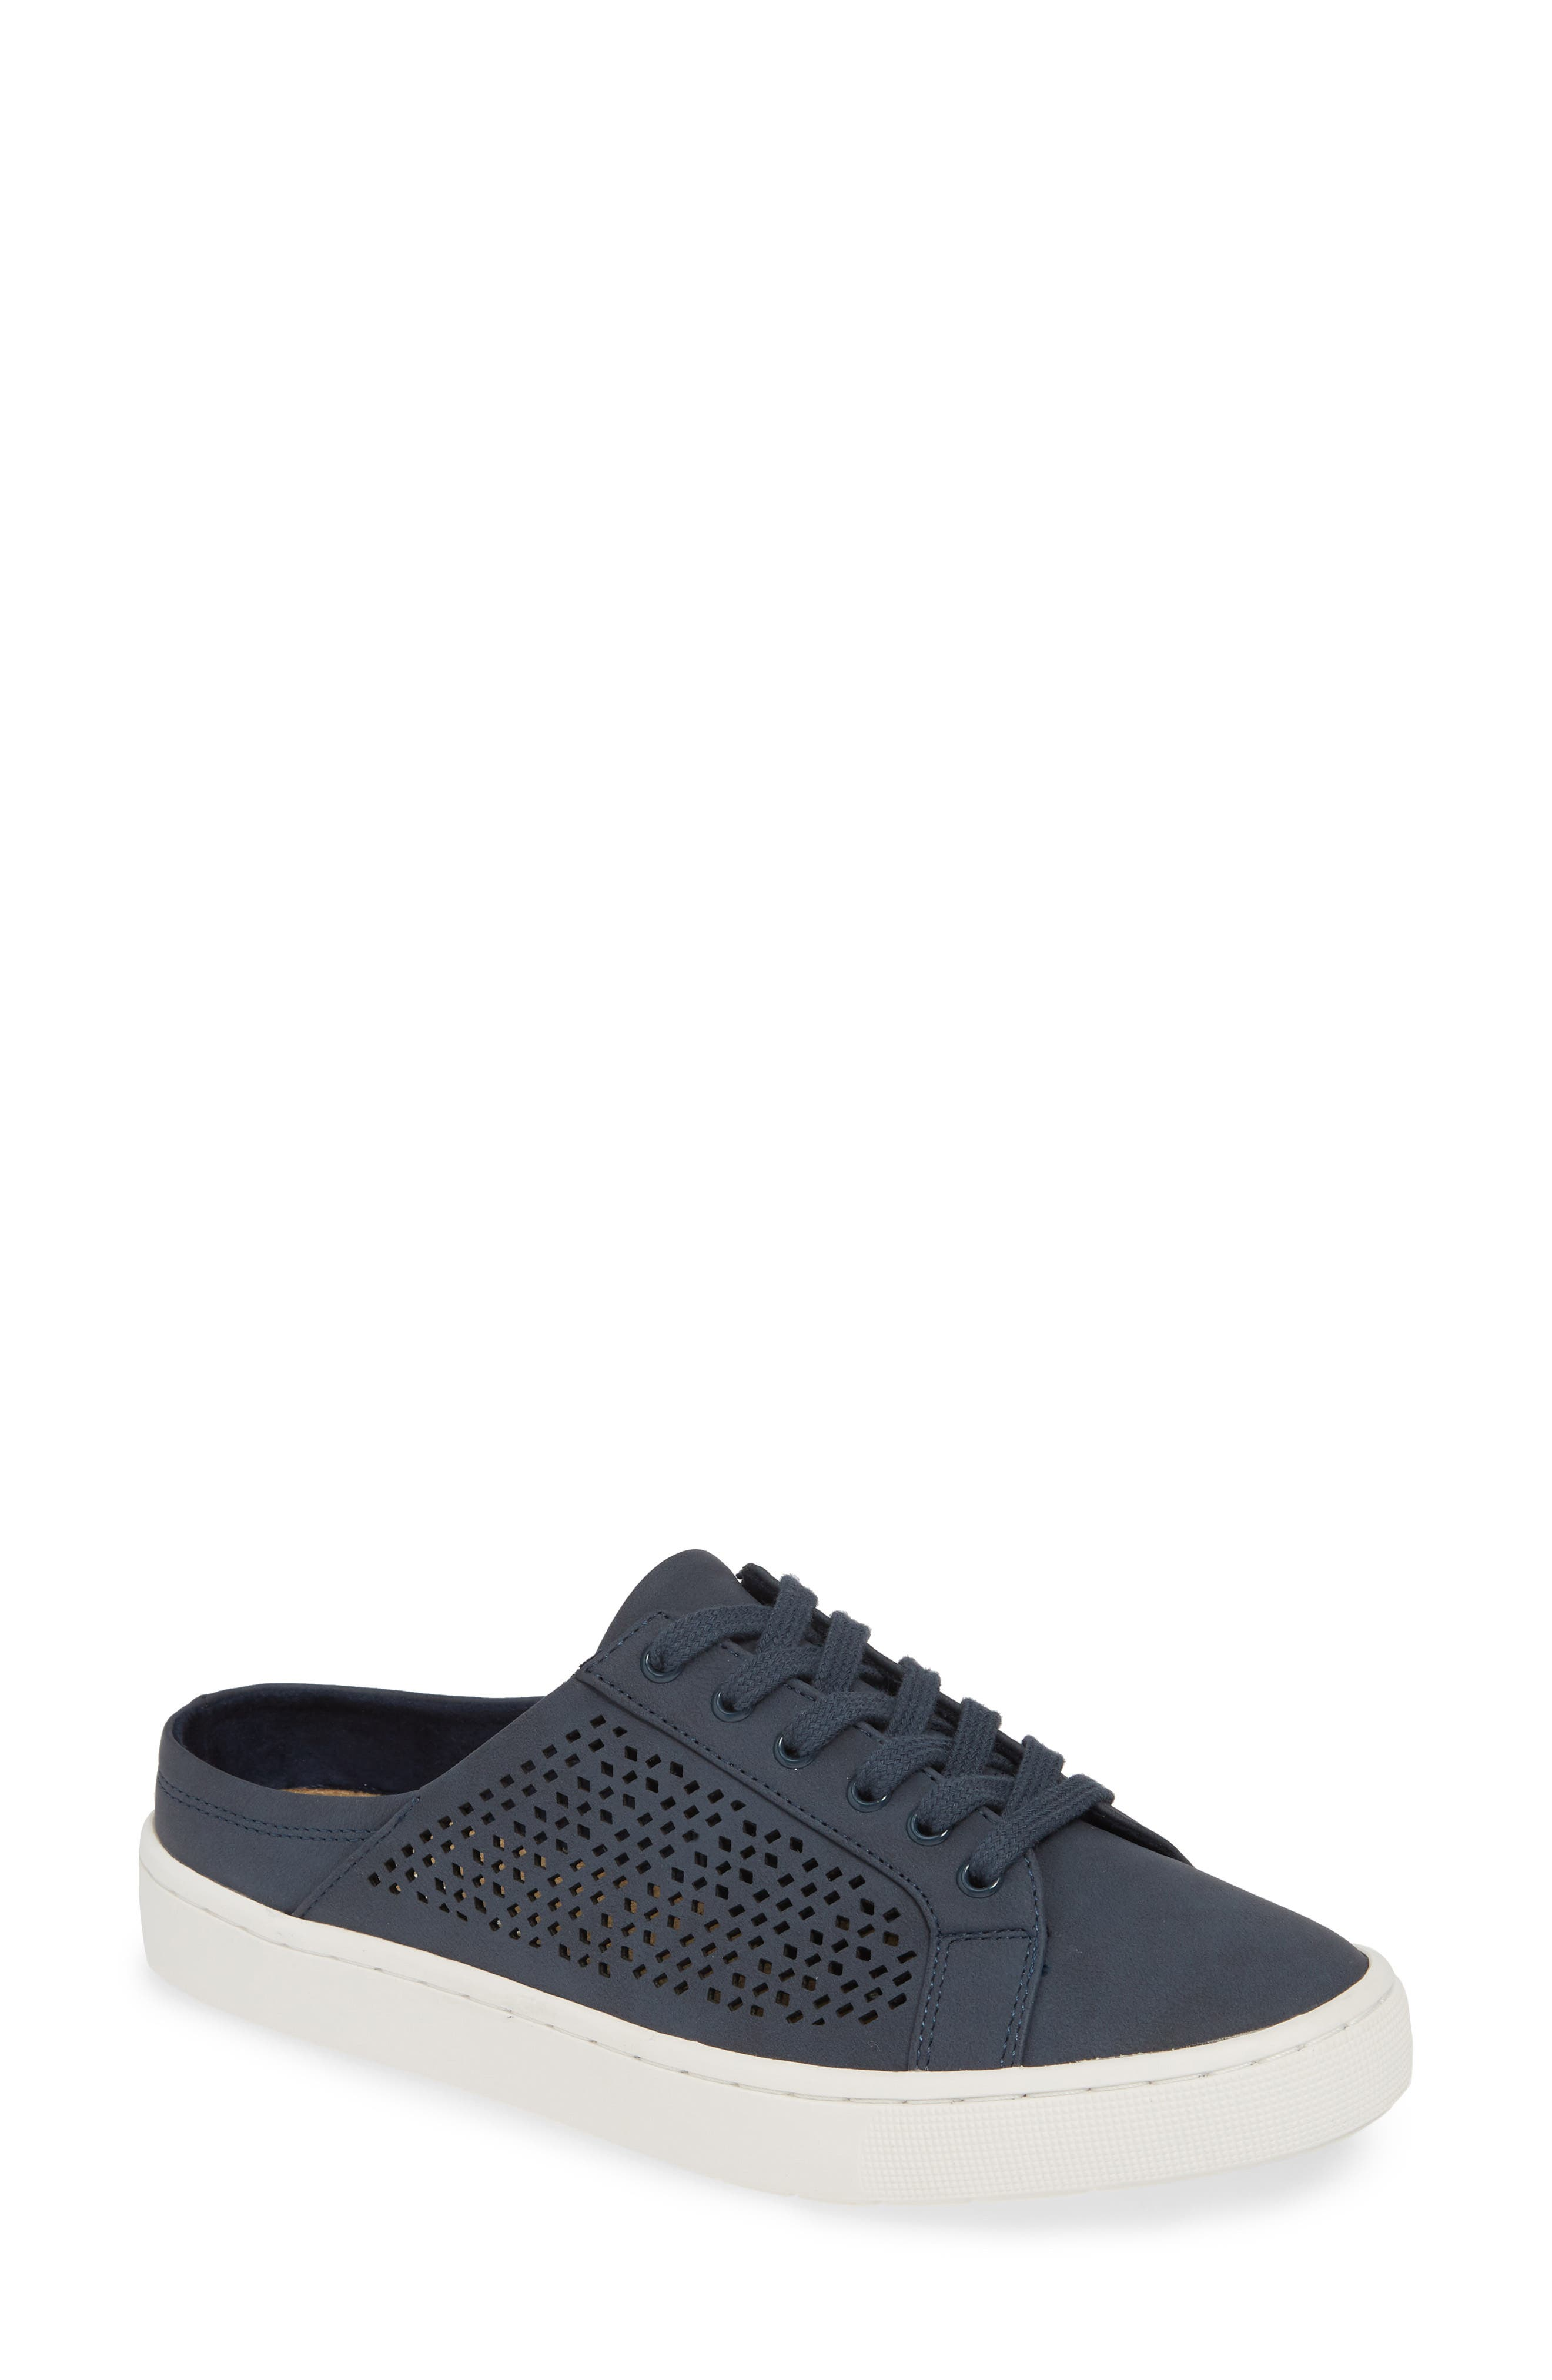 BELLA VITA, Star Open Back Sneaker, Main thumbnail 1, color, DENIM FABRIC